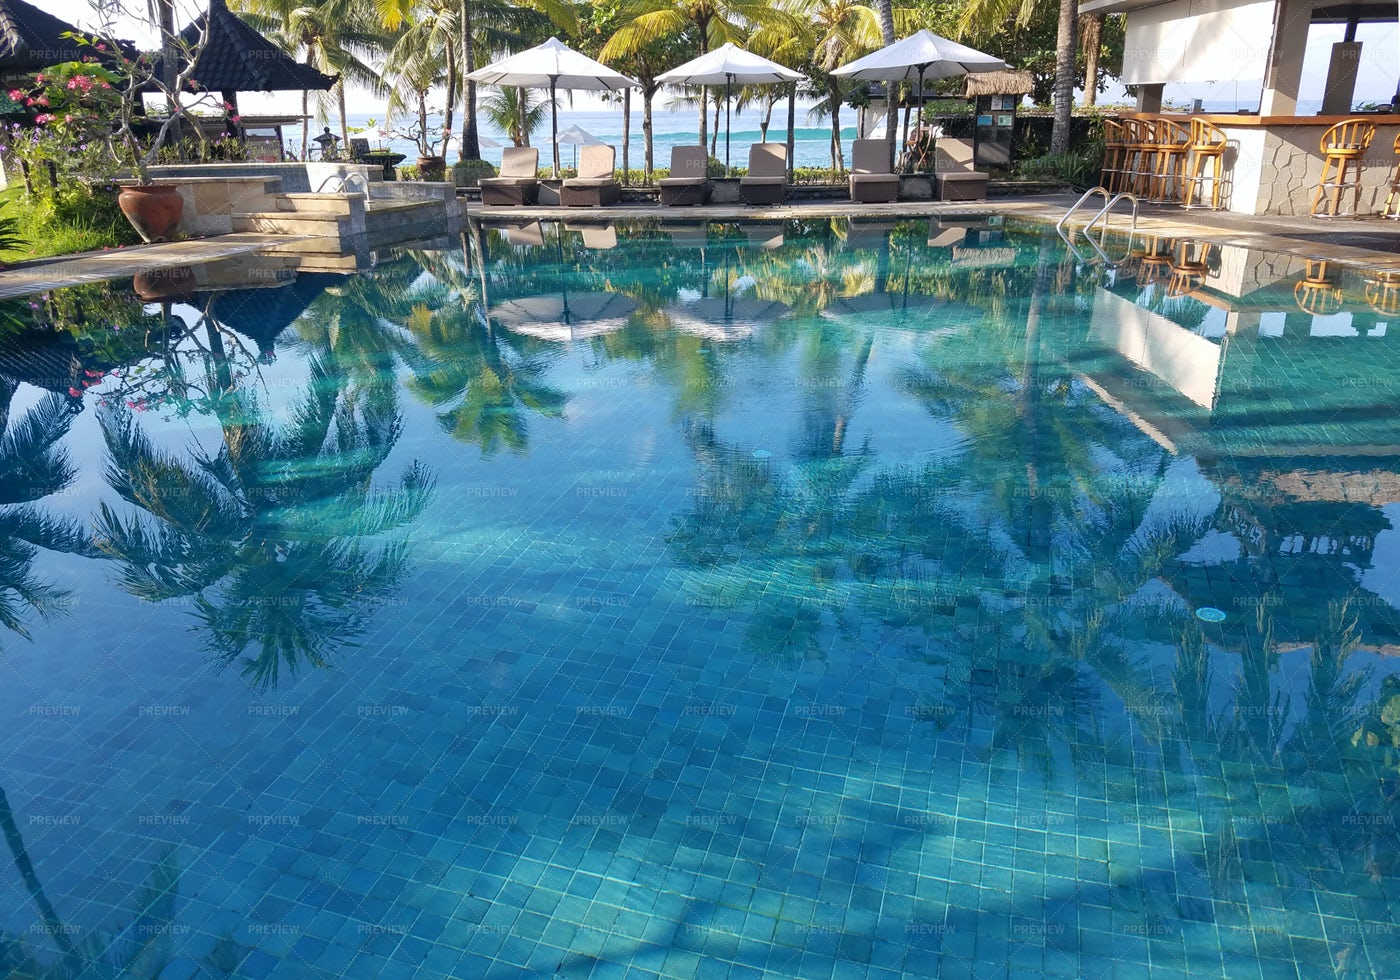 Pool Bar In A Bali Resort: Stock Photos